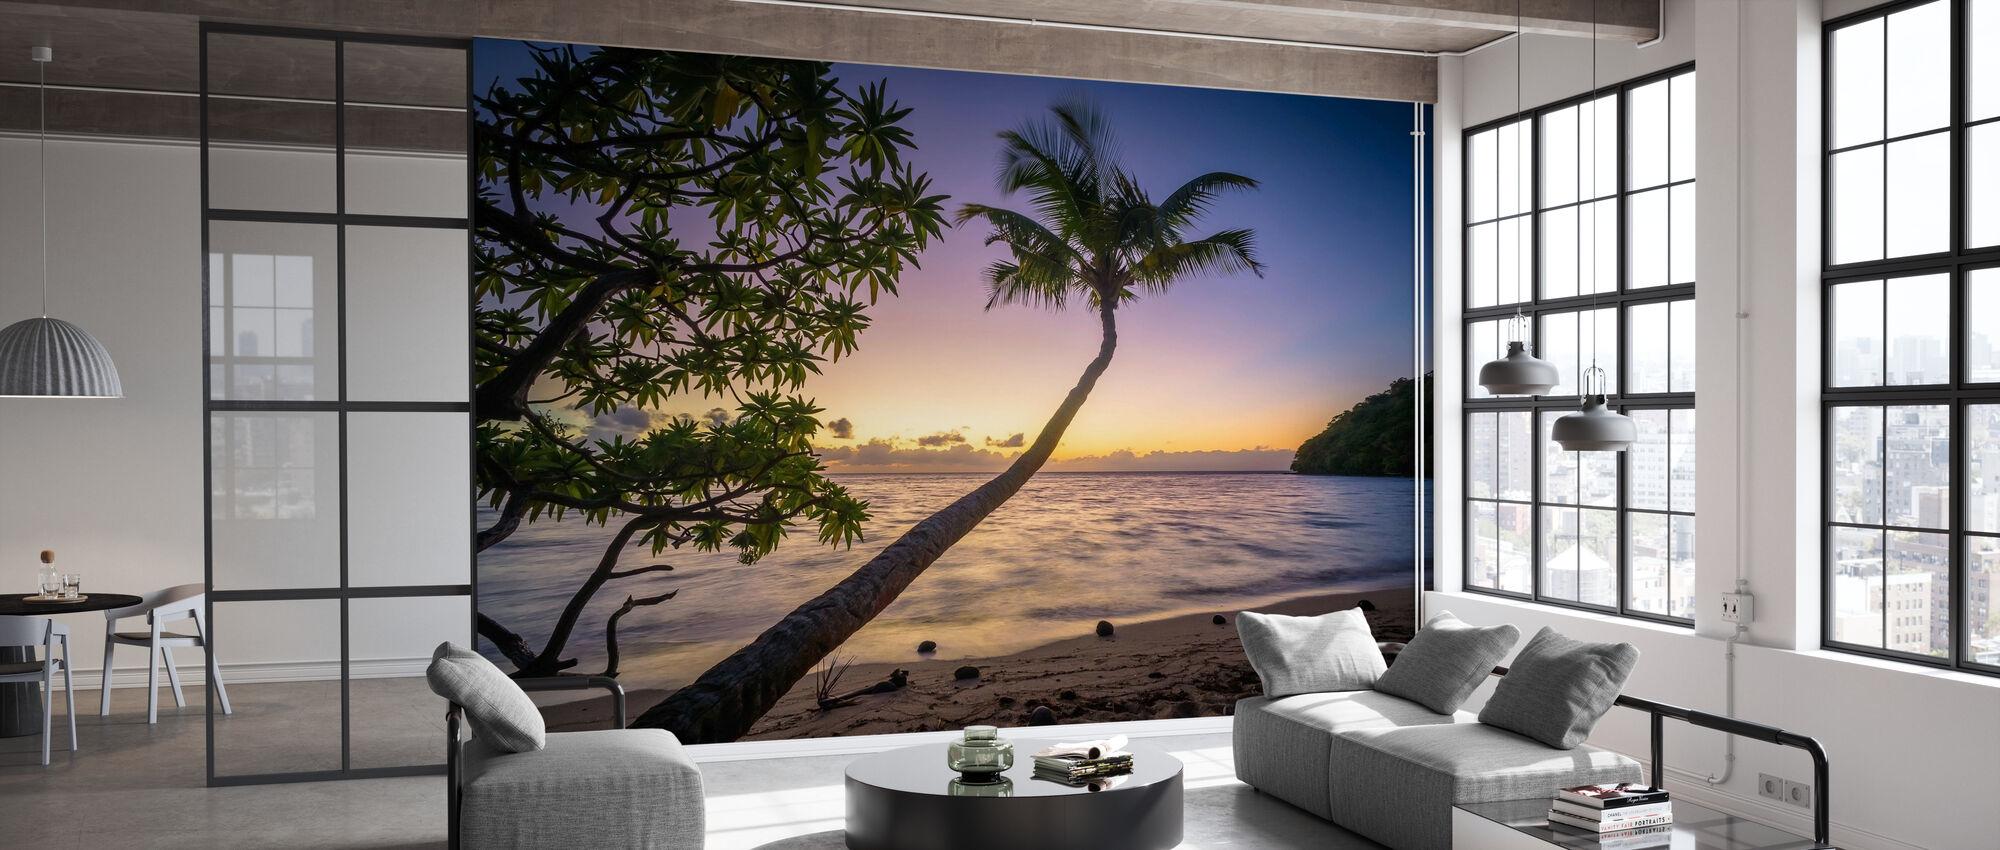 Sunset Beach - Tapet - Kontor